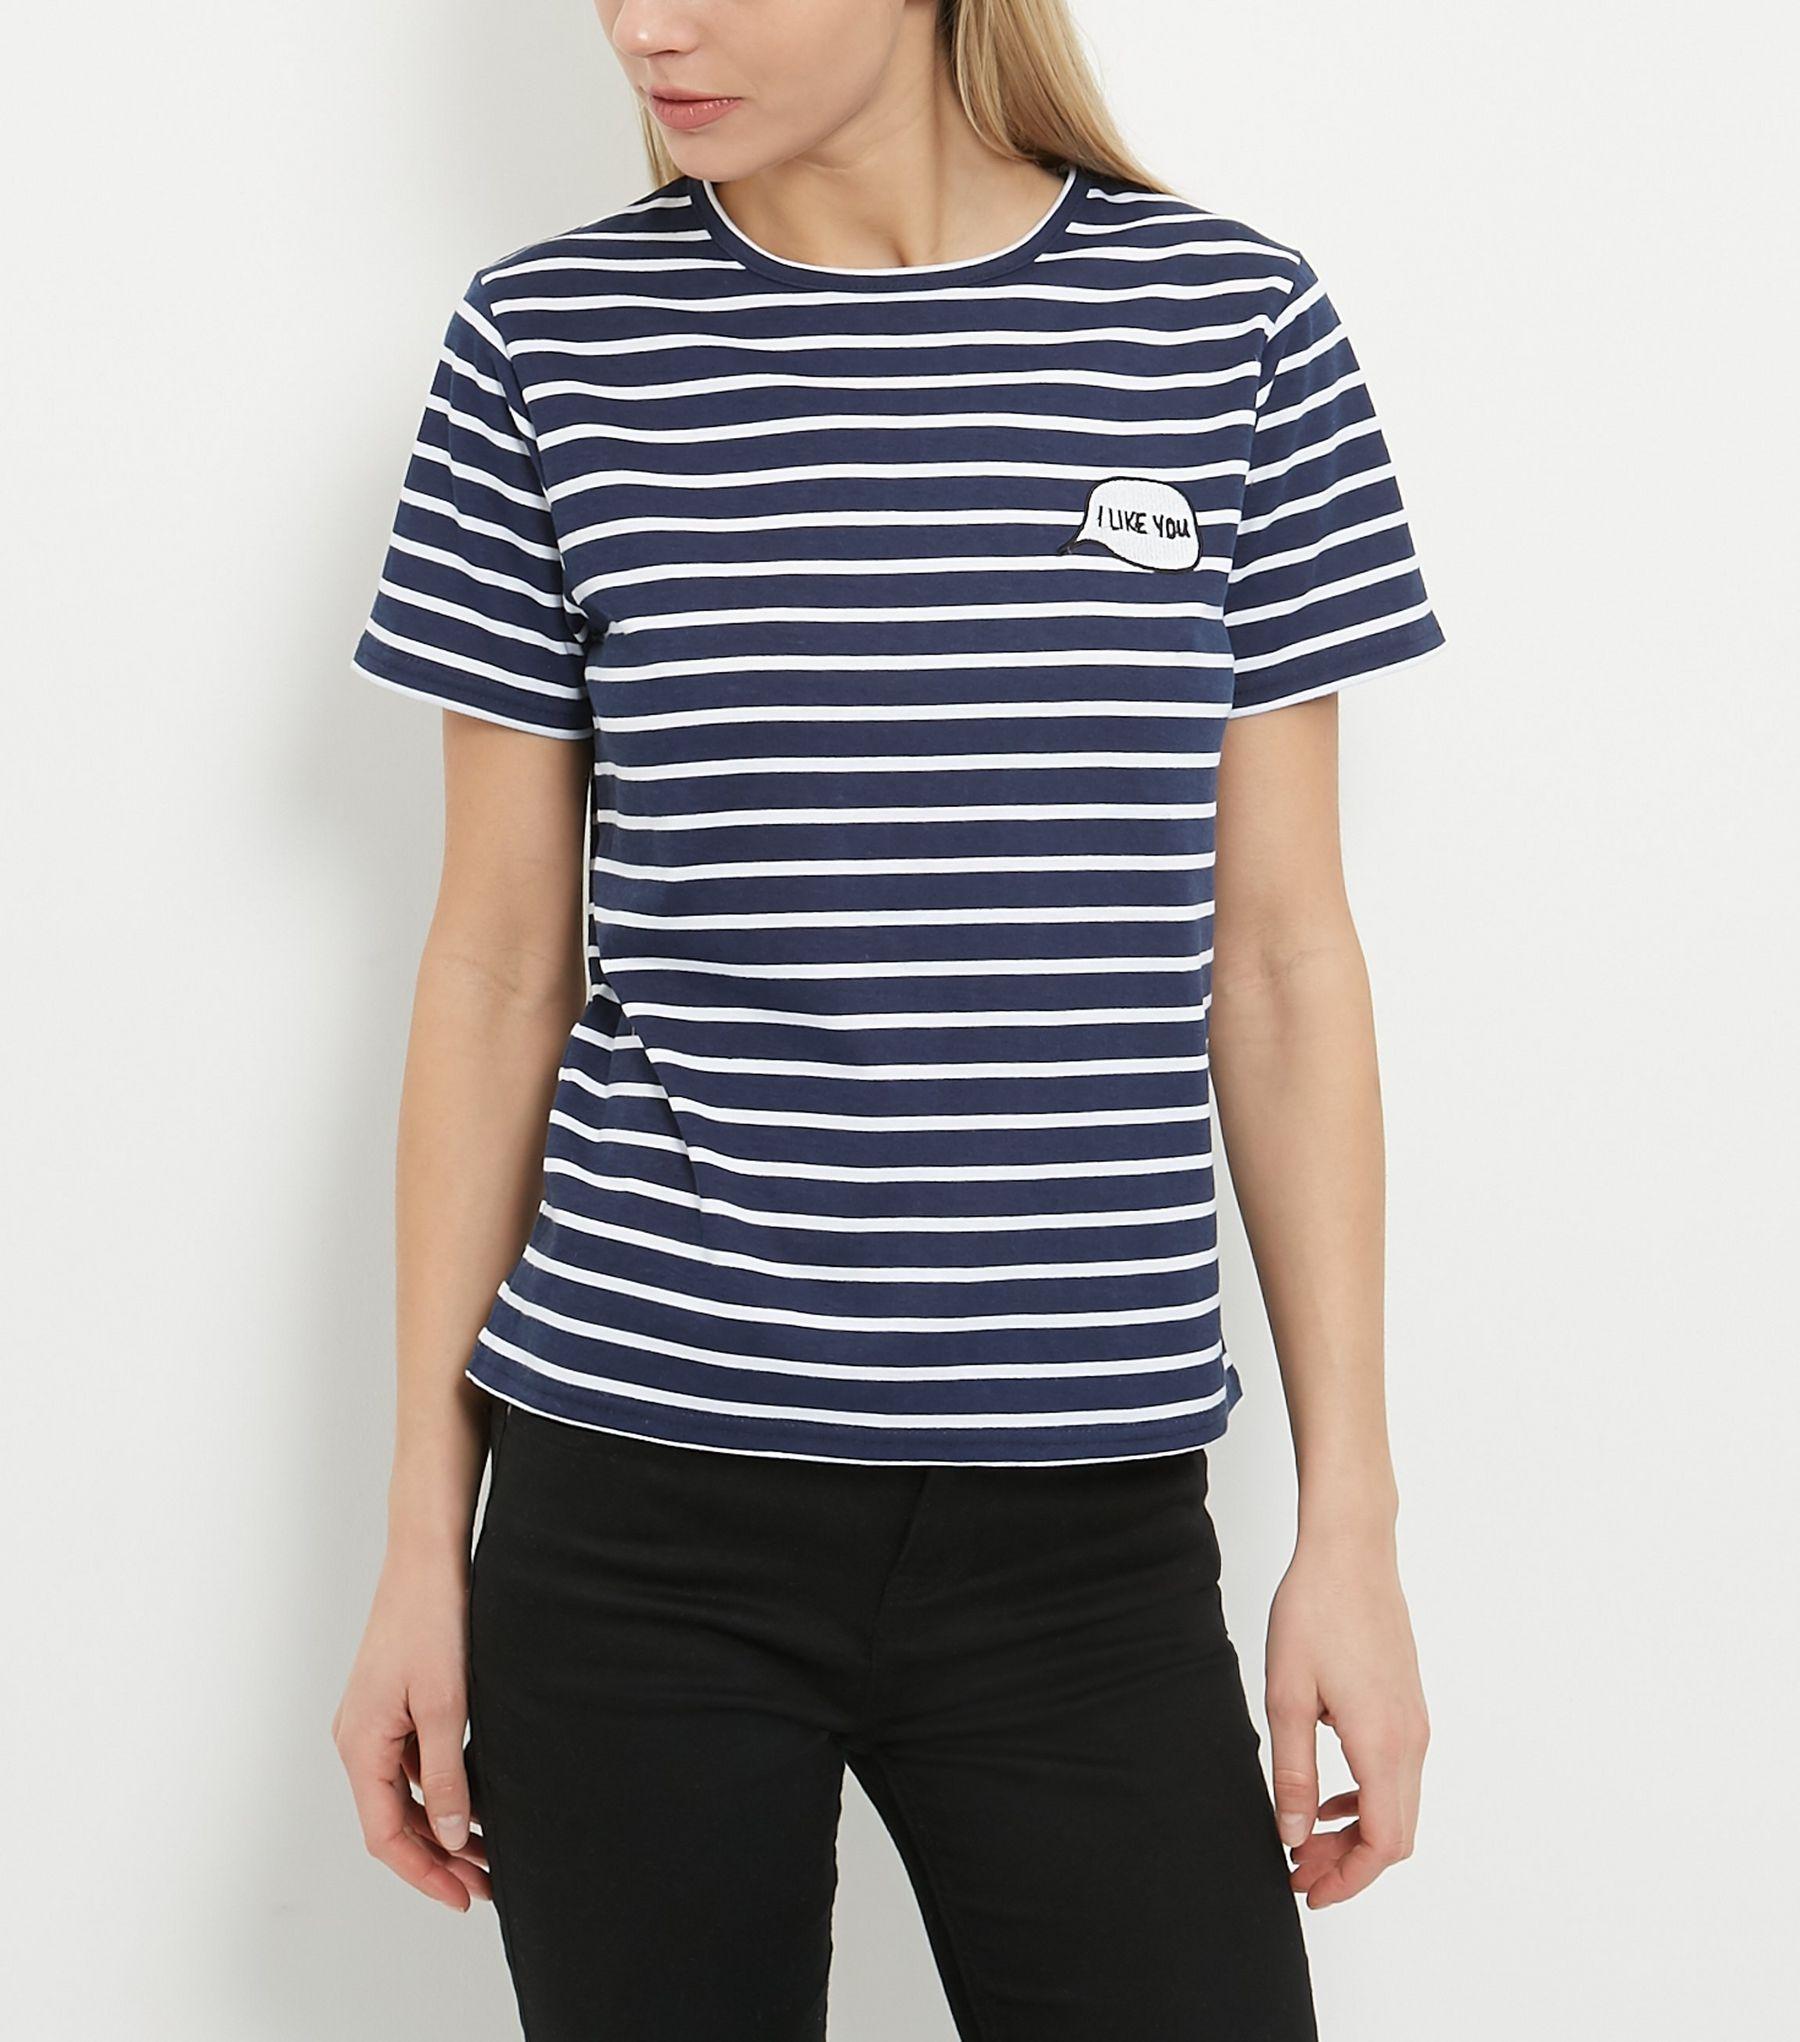 Heartbreak Navy Stripe I Like You Print T-Shirt | New Look